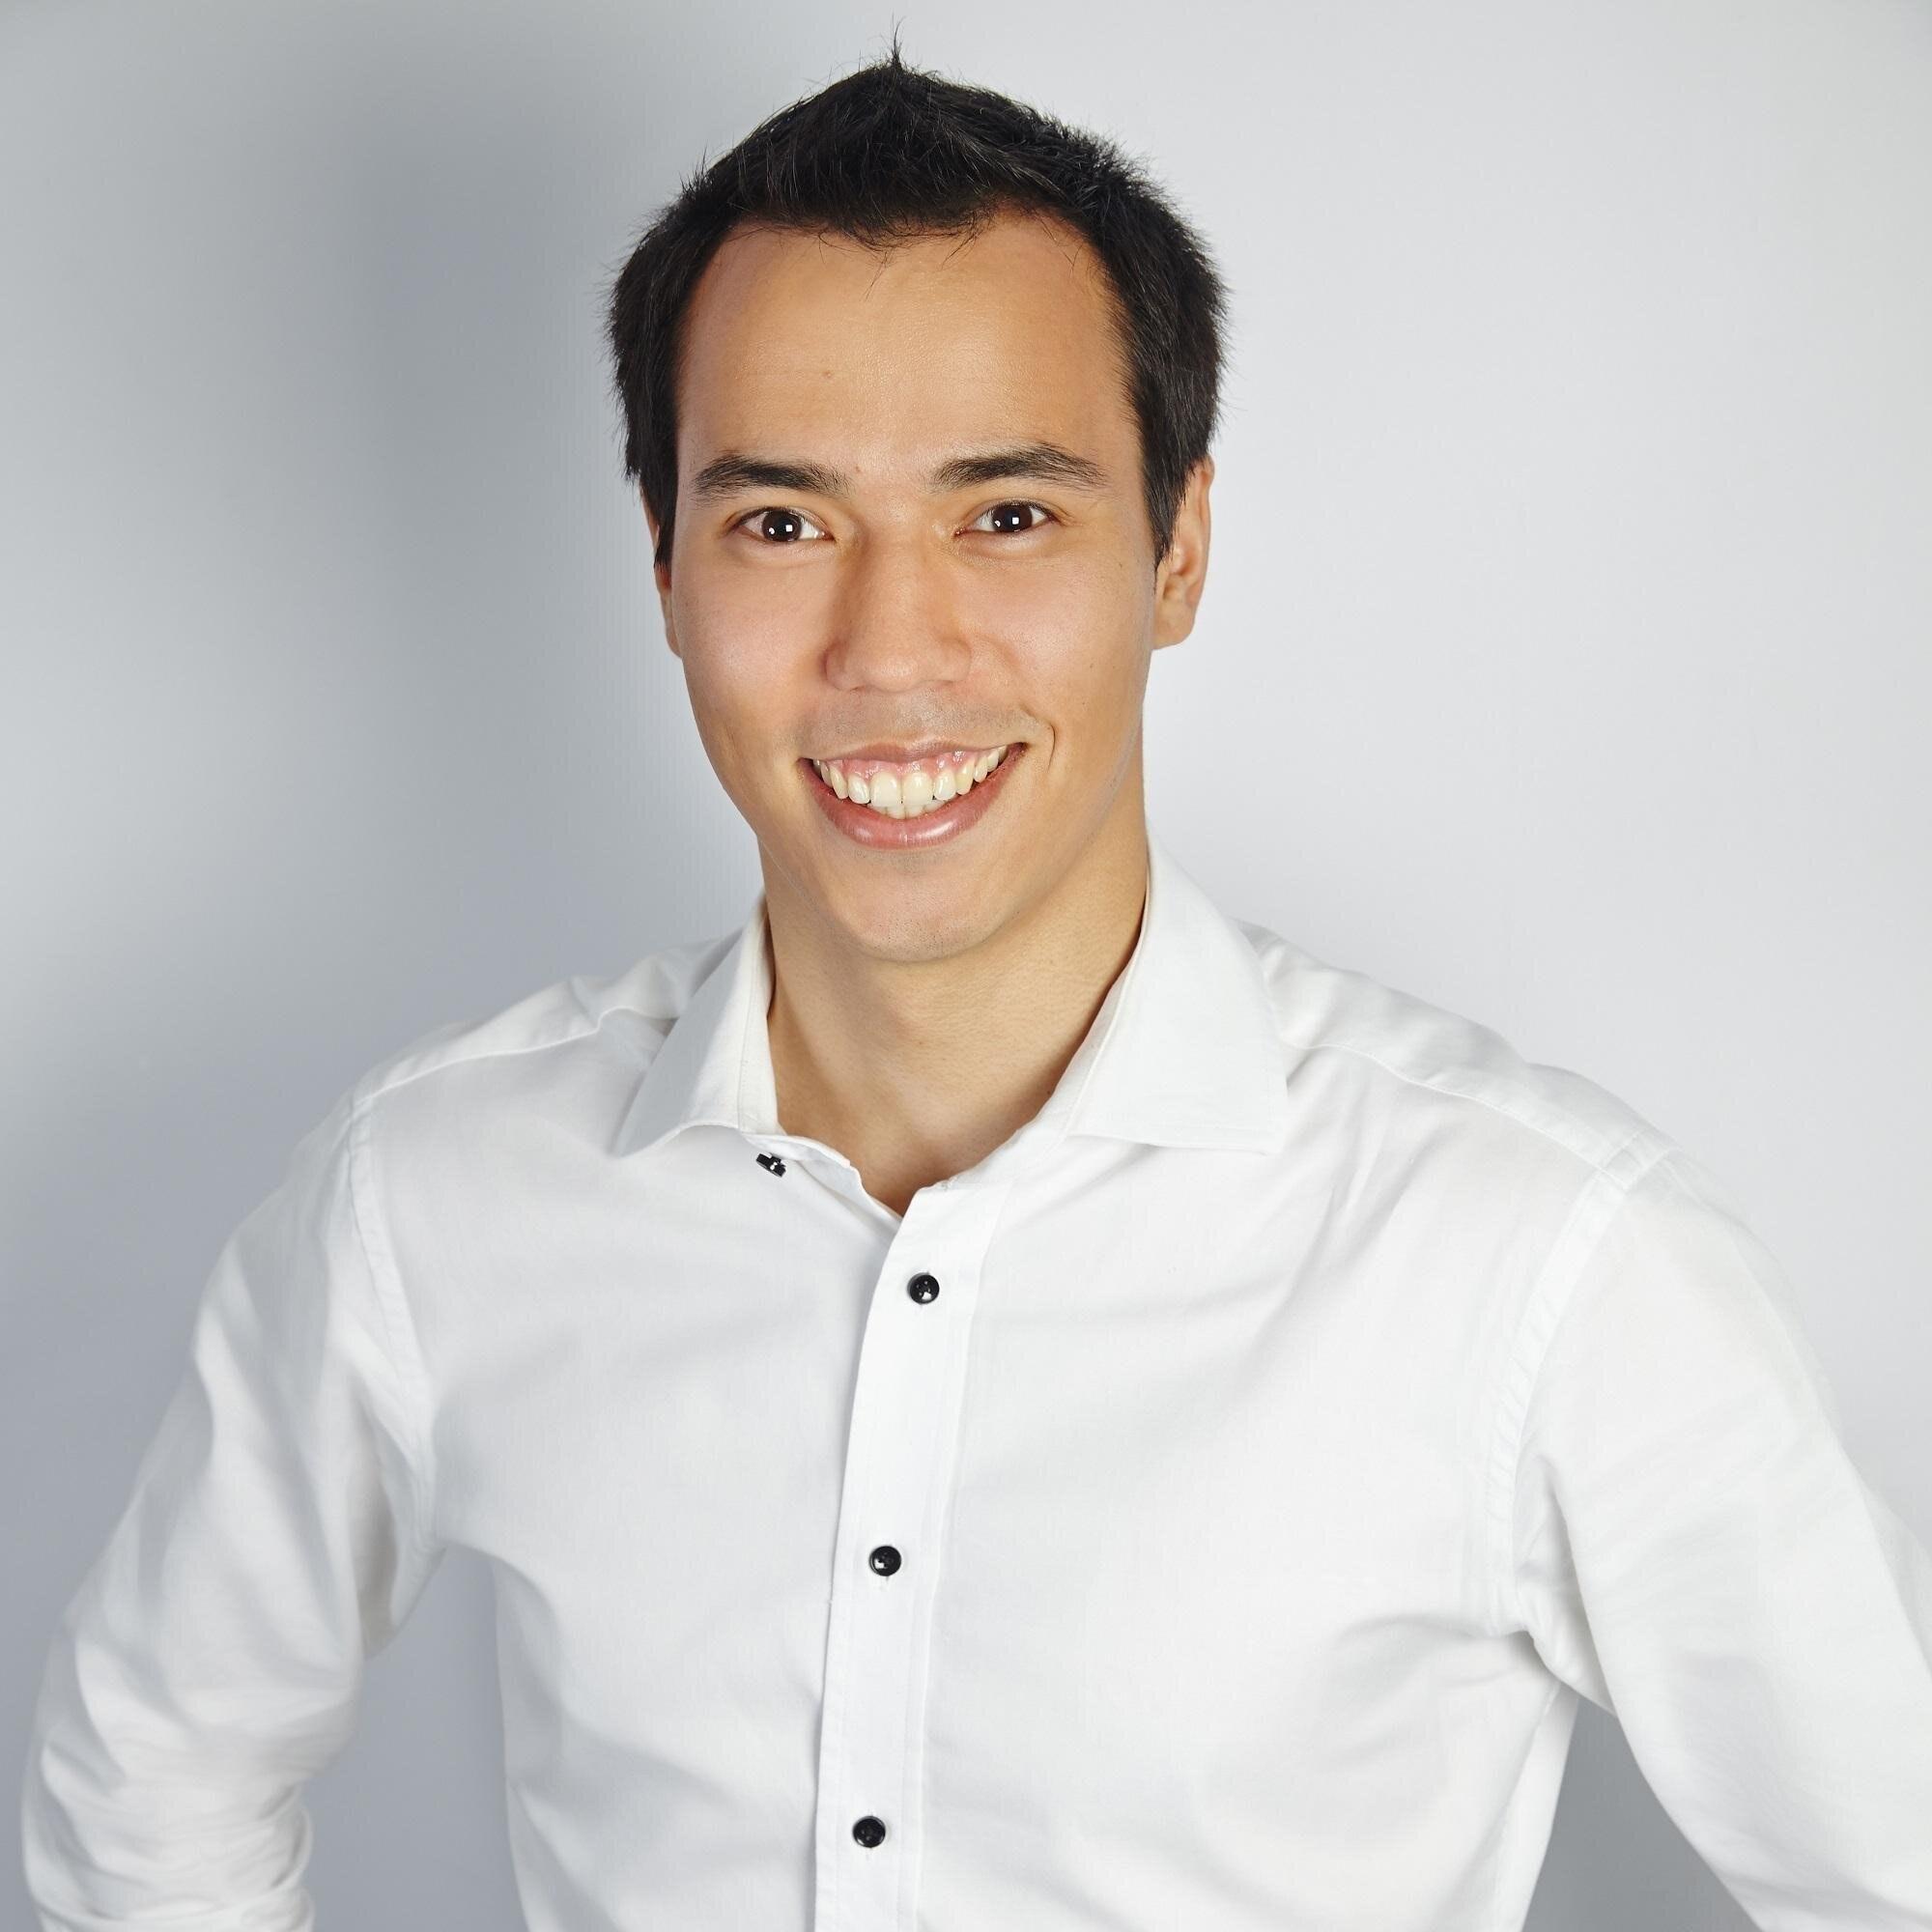 Nadir Khabdulin